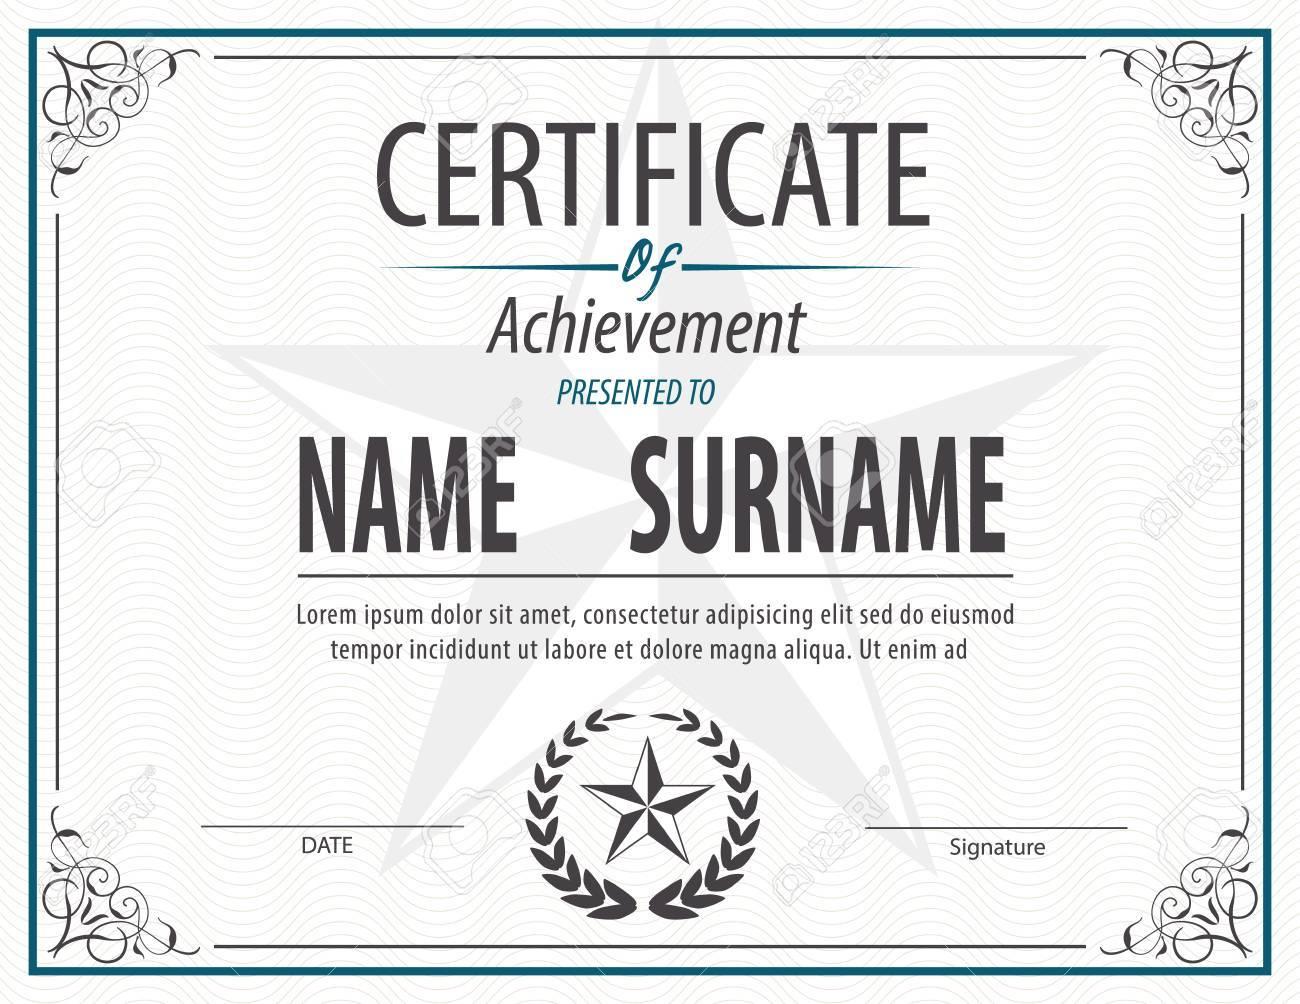 Horizontal certificate templatediplomaletter size vector royalty horizontal certificate templatediplomaletter size vector stock vector 46627106 spiritdancerdesigns Images